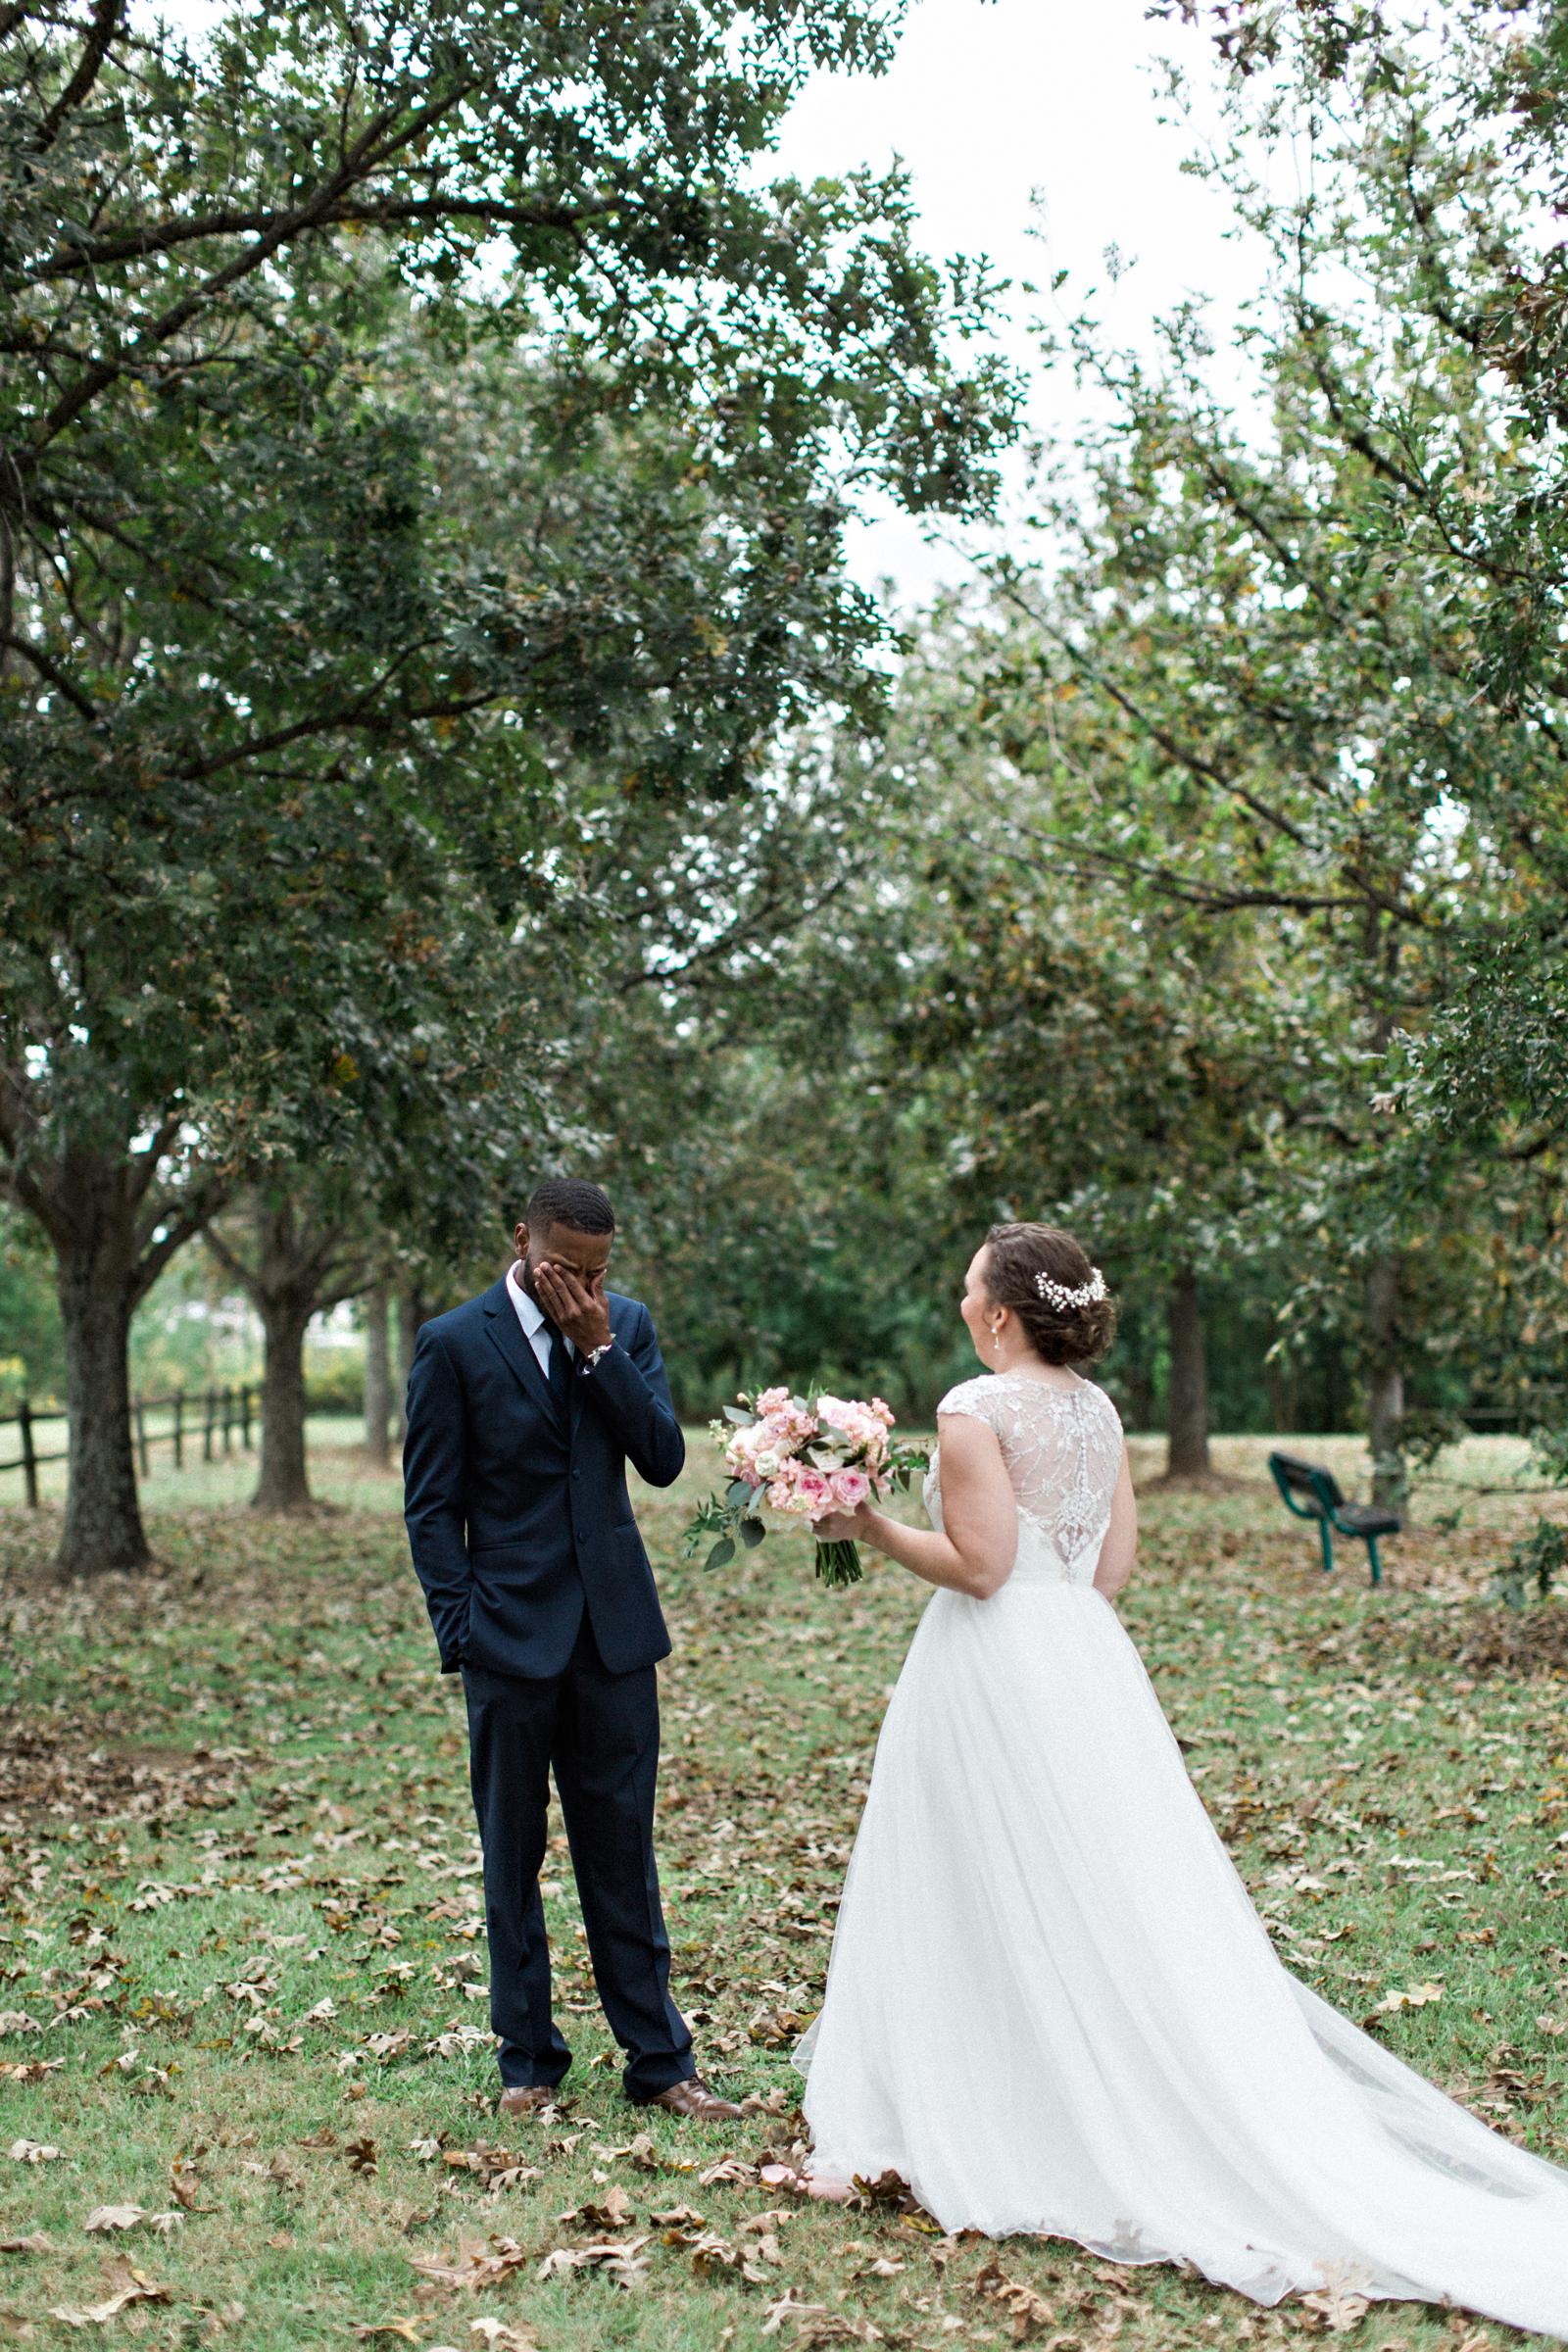 Alabama-Wedding-Photography-Nick-Drollette-Cory-Laura-120.jpg